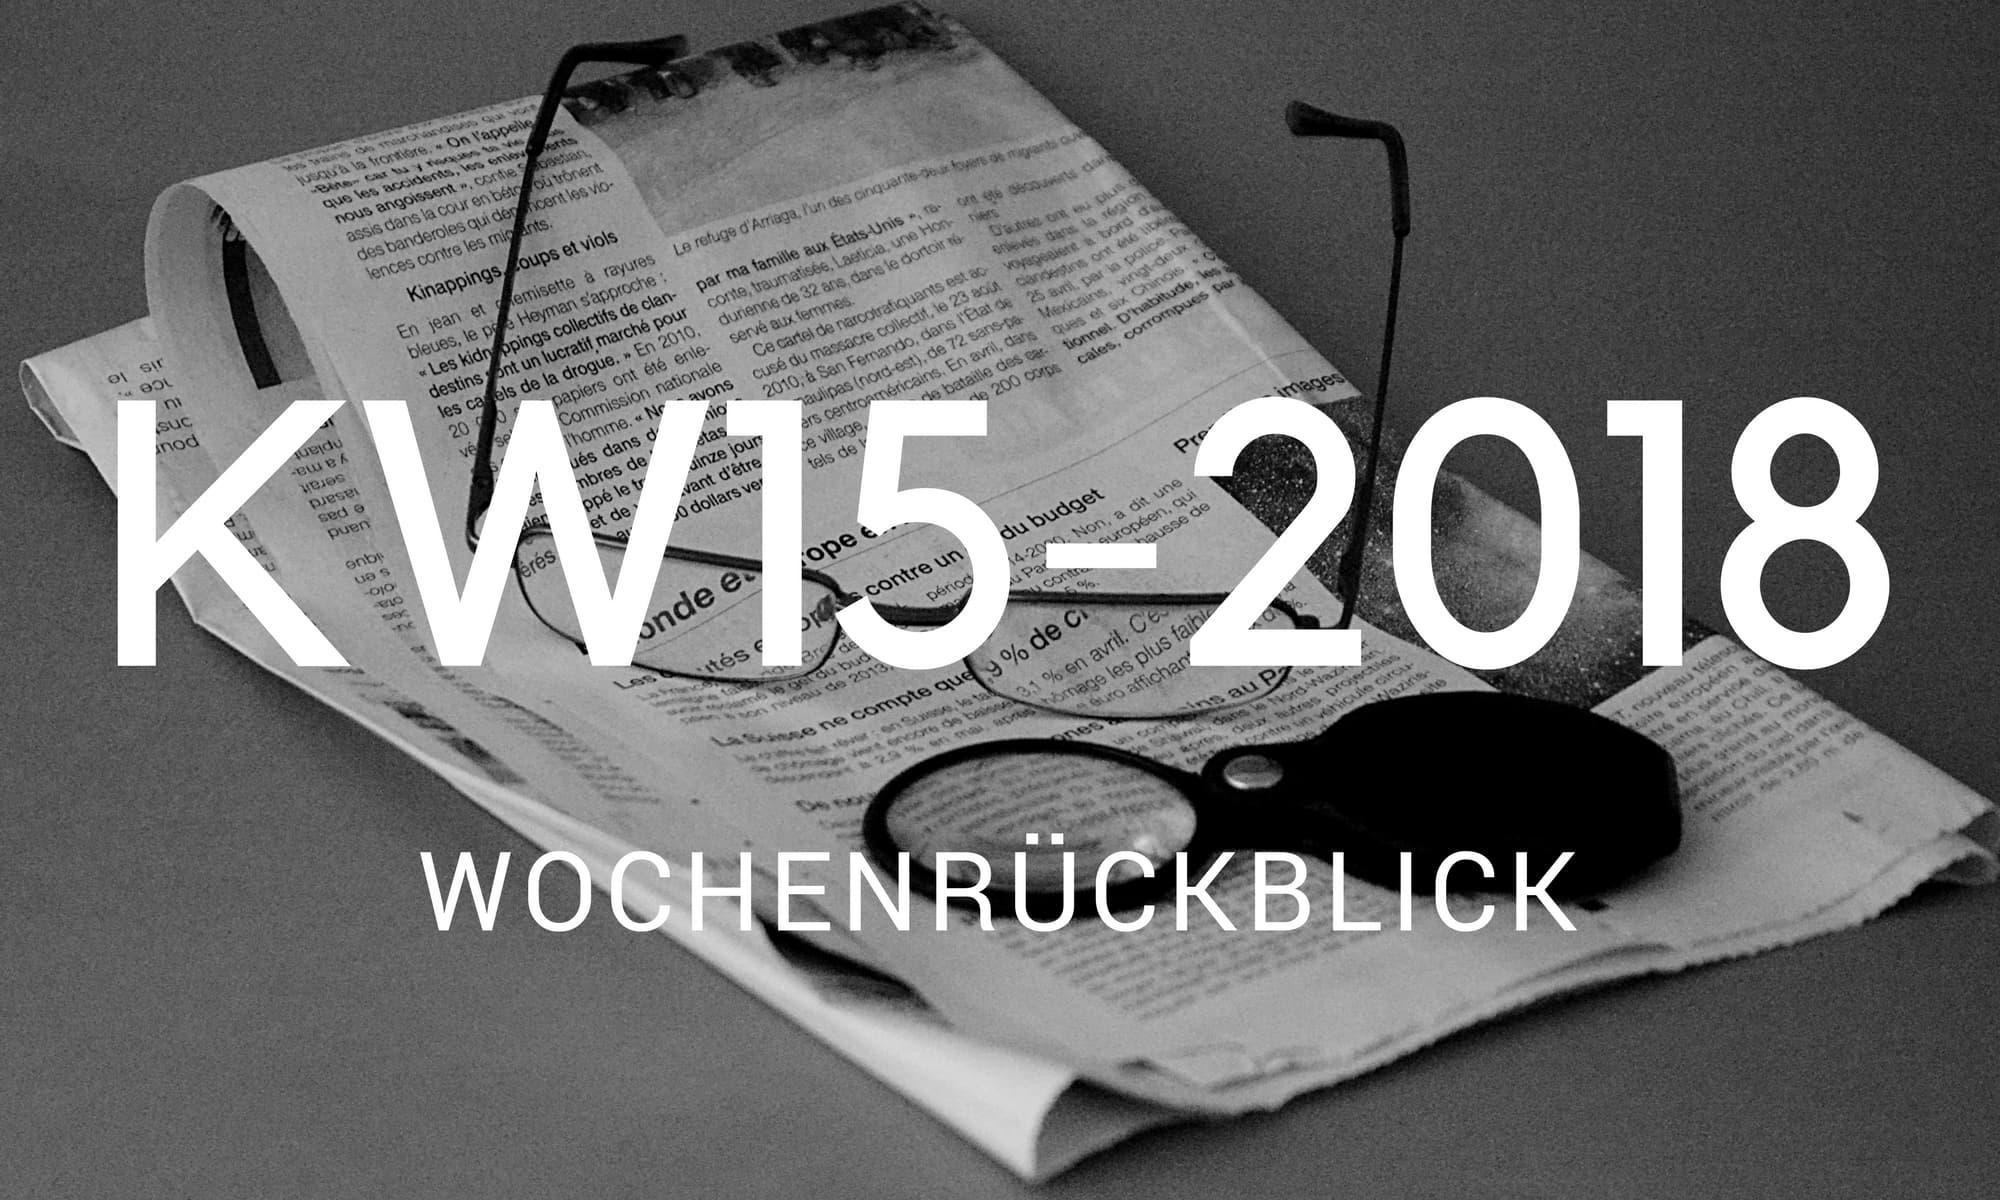 wochenrueckblick camping news KW15 2018